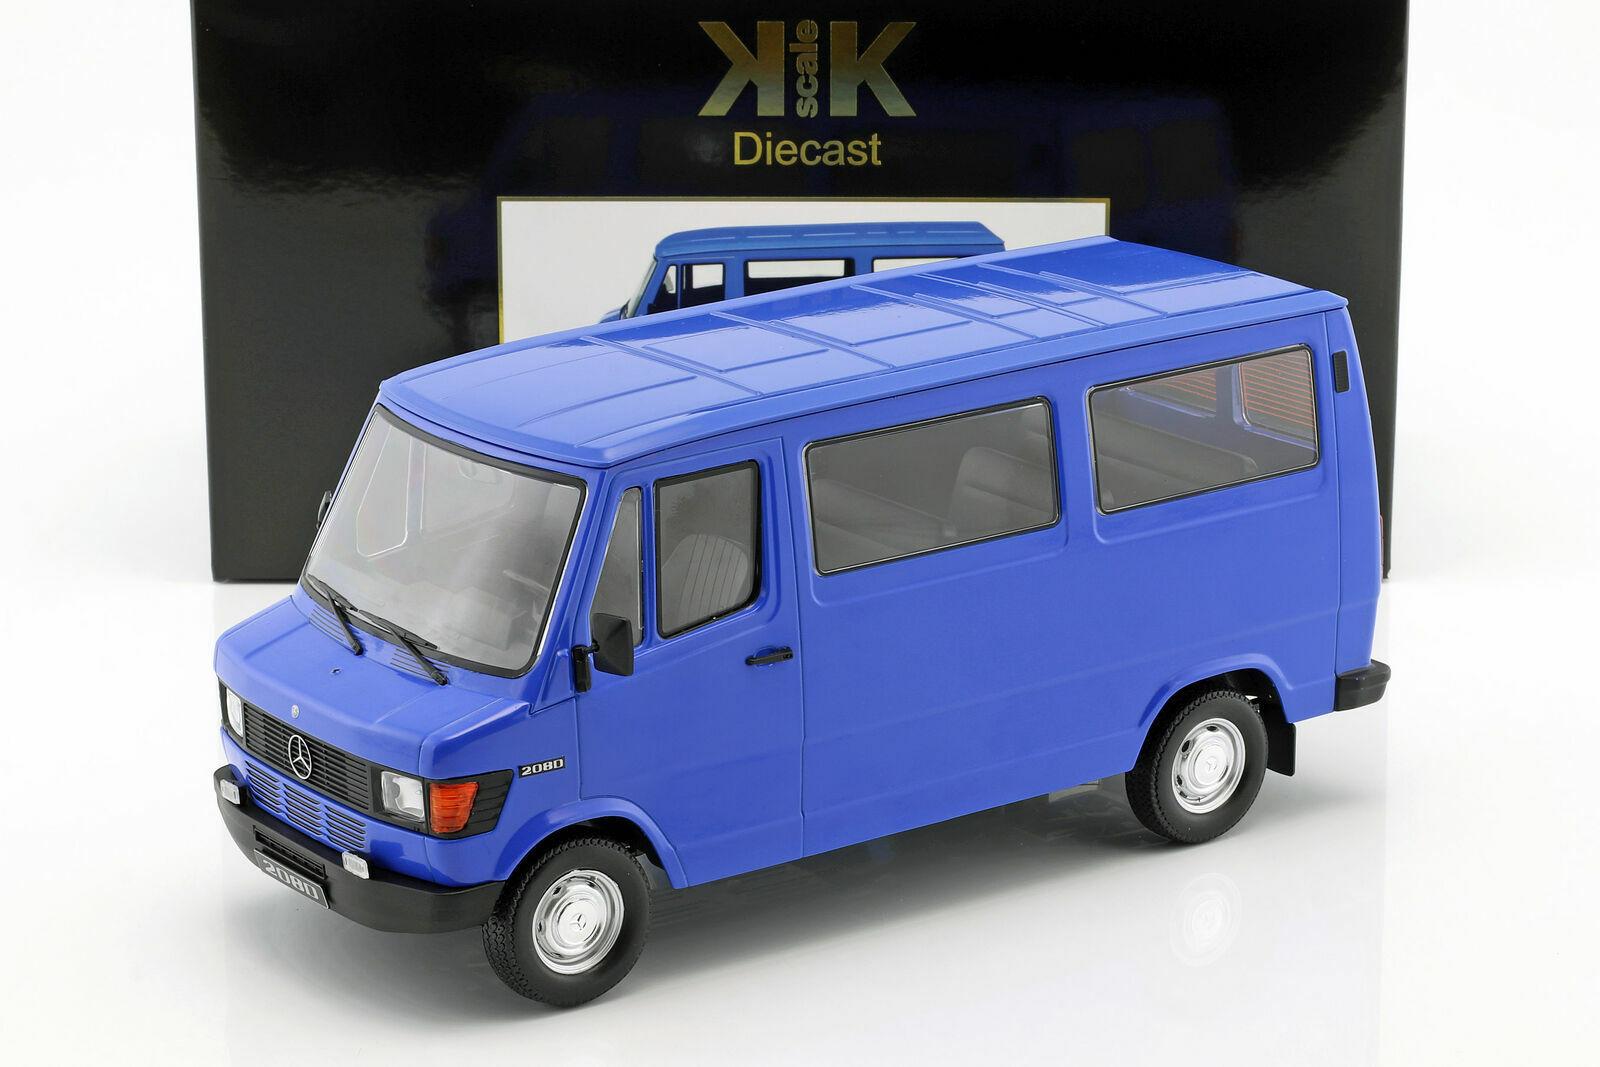 MERCEDES 208D VITRE 1988 bleu KKSCALE KKDC180293 1 43 BENZ MINIBUS RESINE 750 P